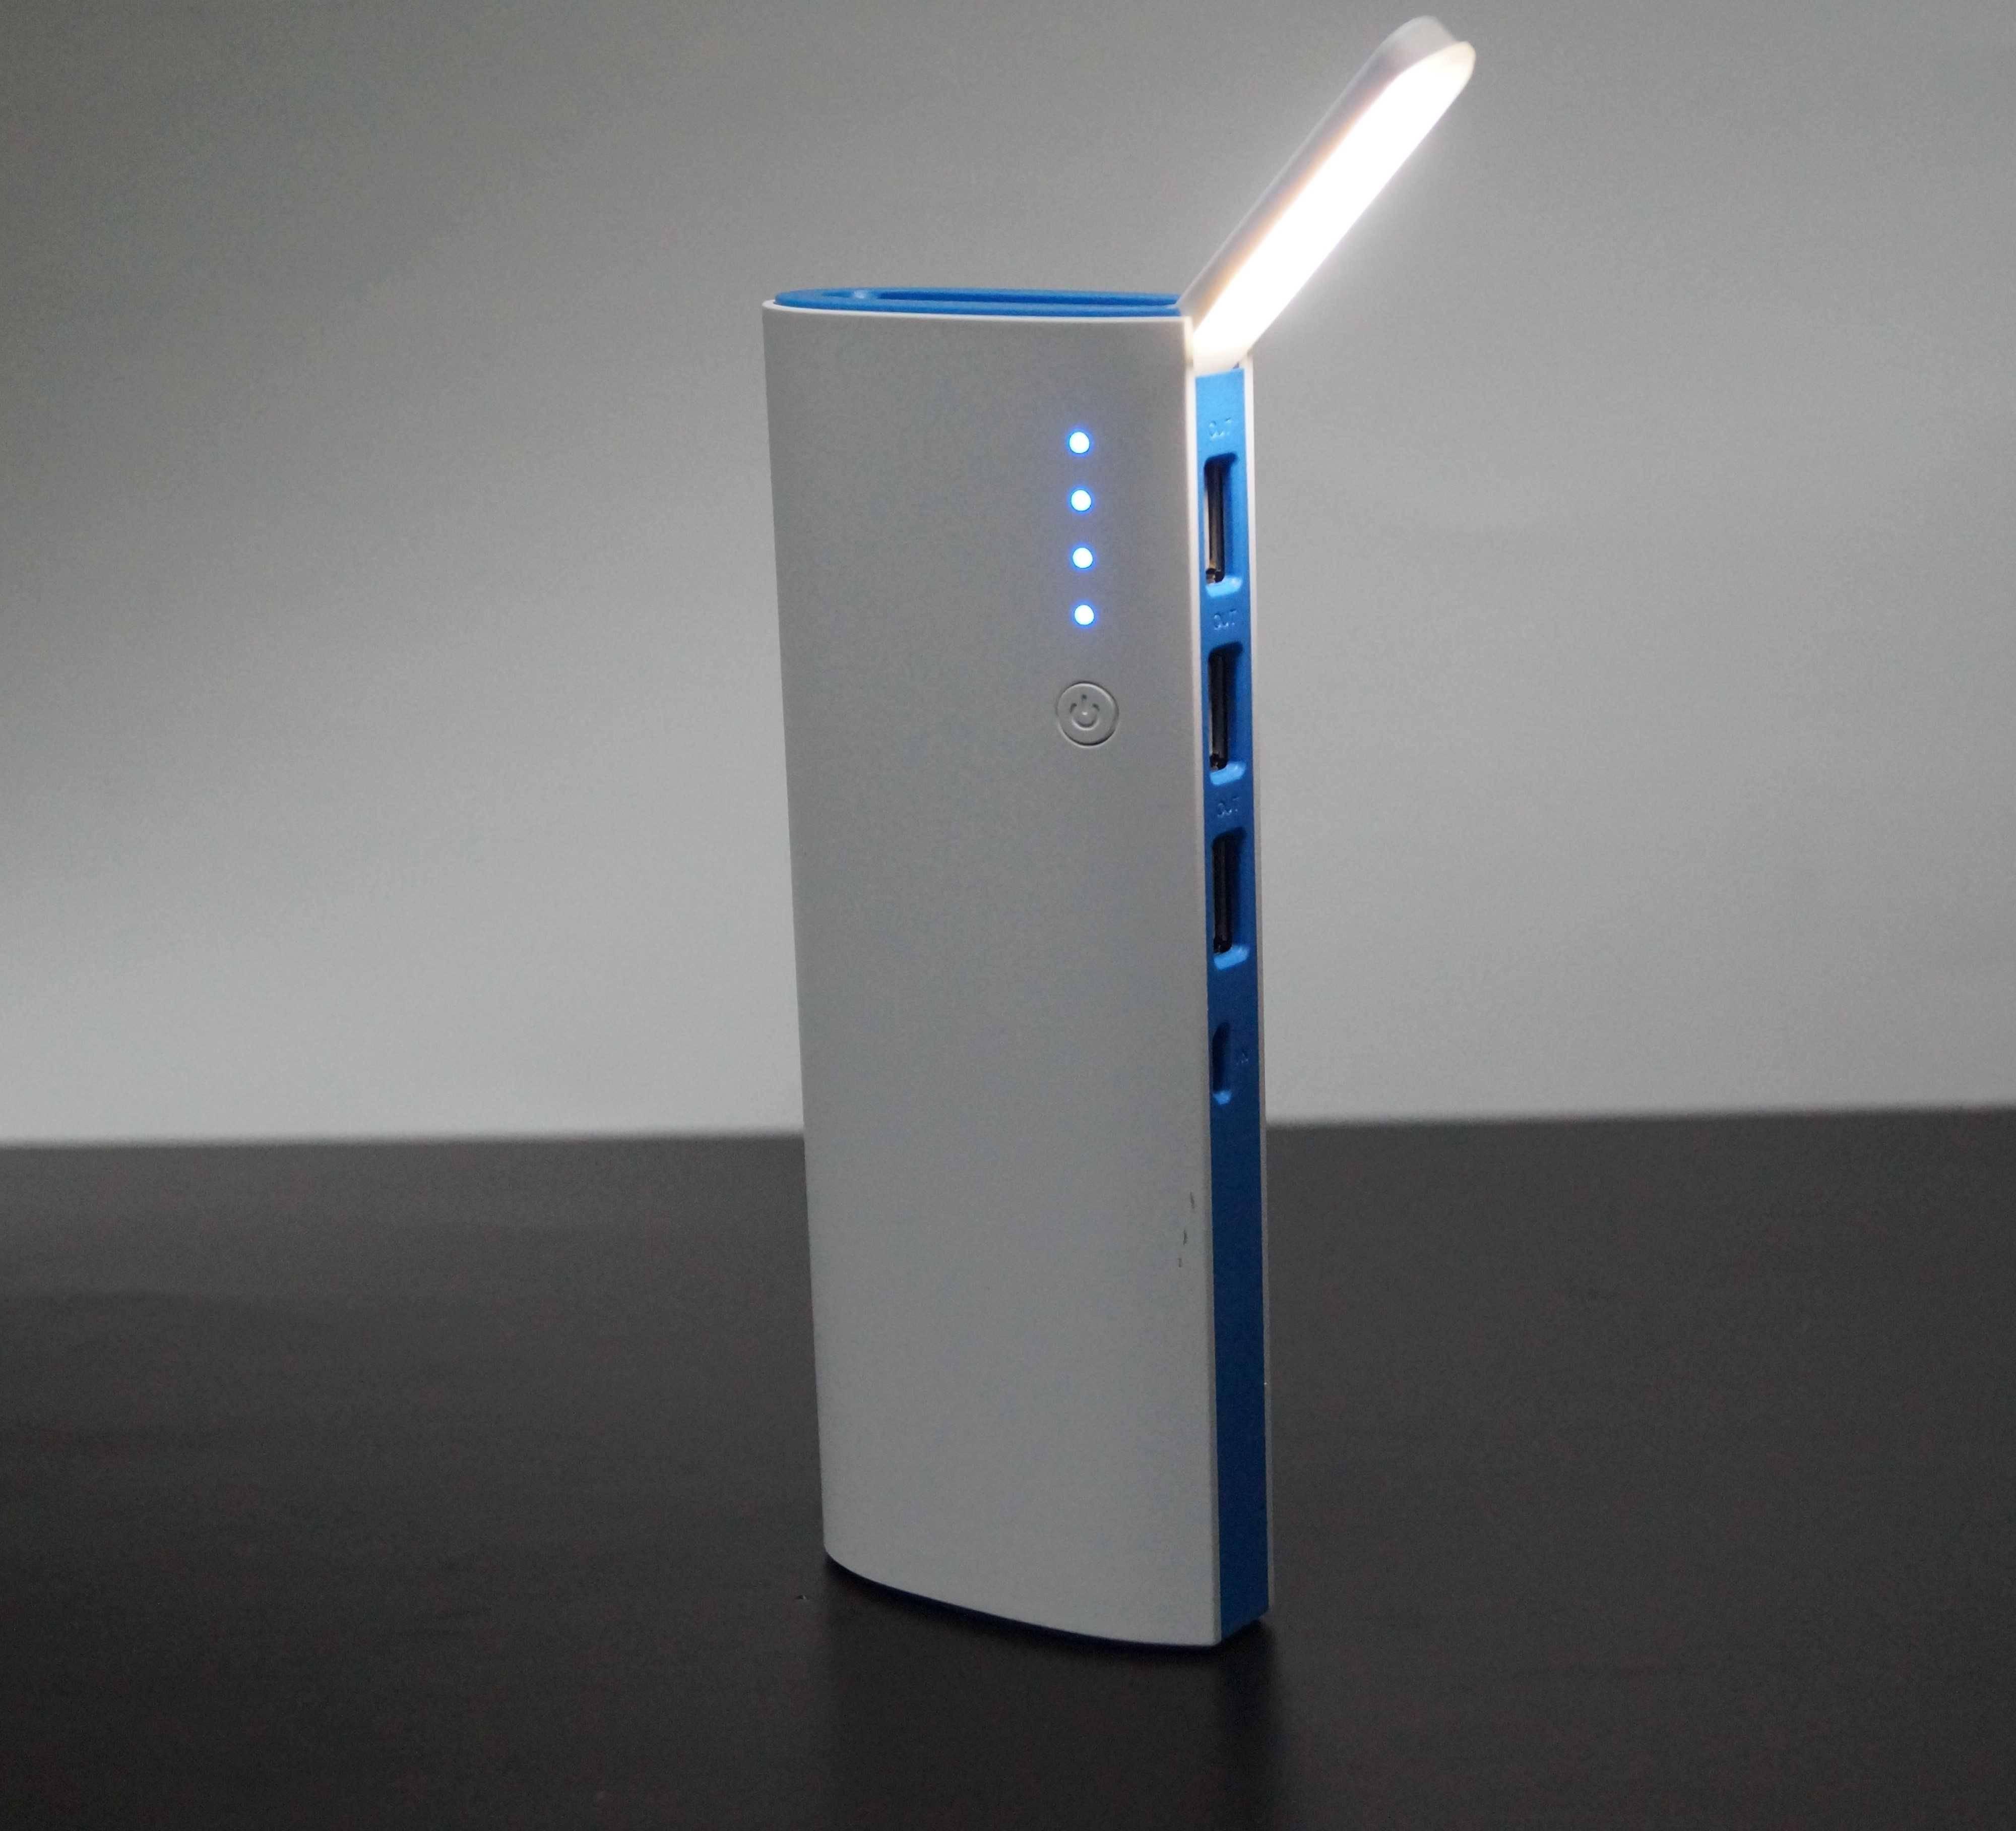 10,400 mAh Power Bank with LED Lamp